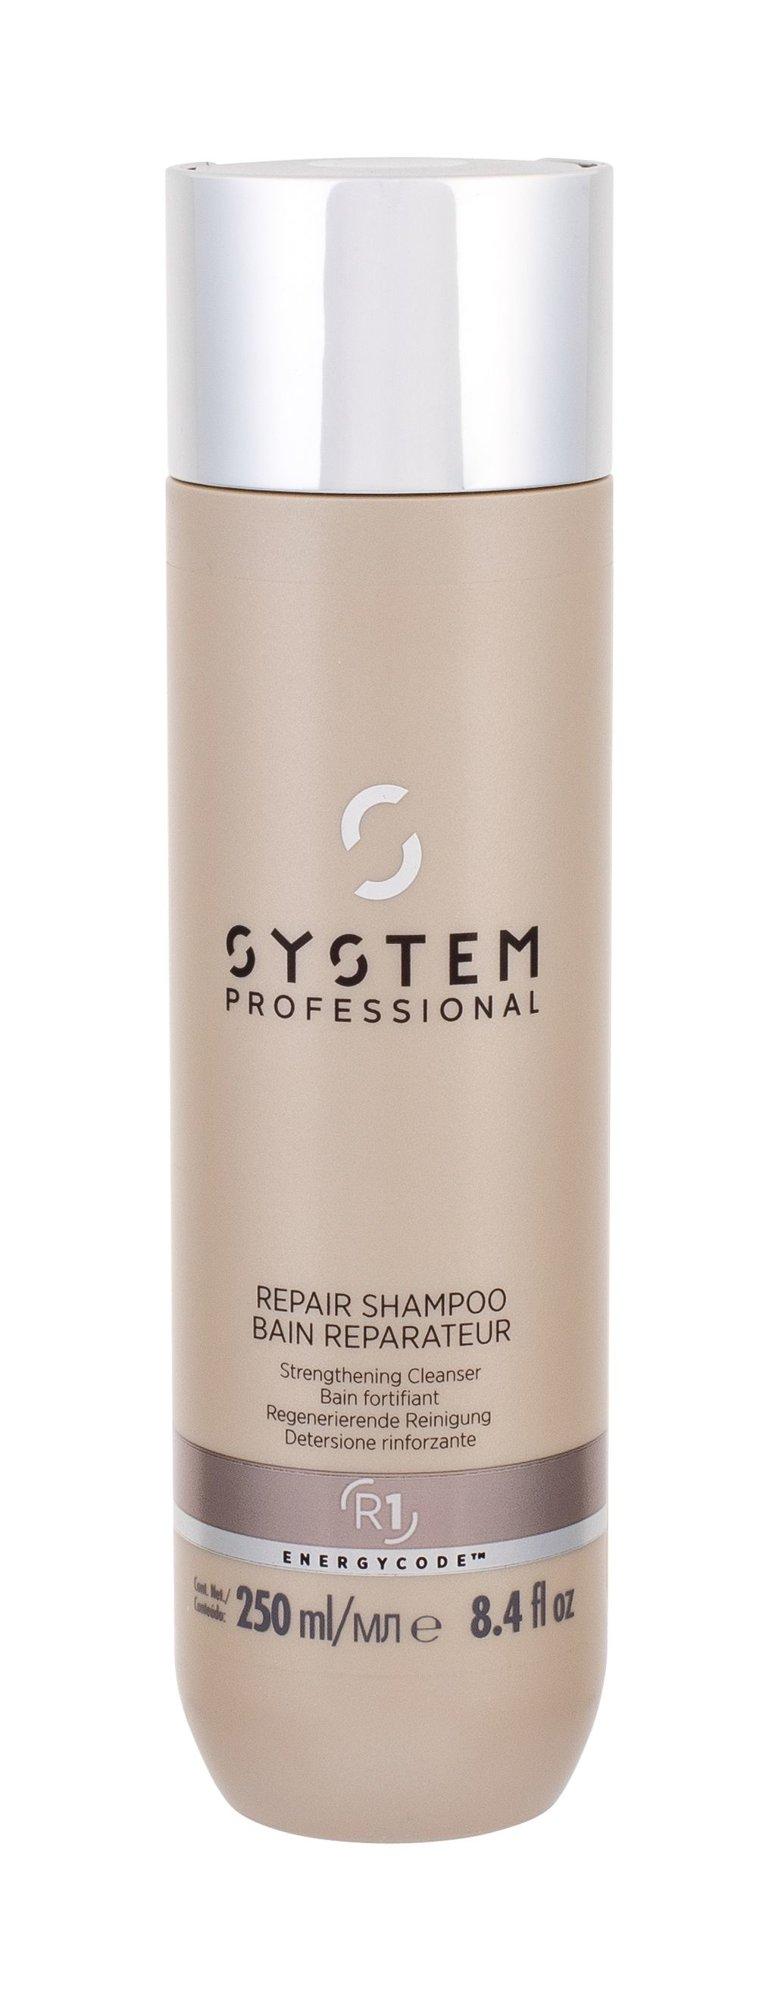 System Professional Repair Shampoo 250ml  R1